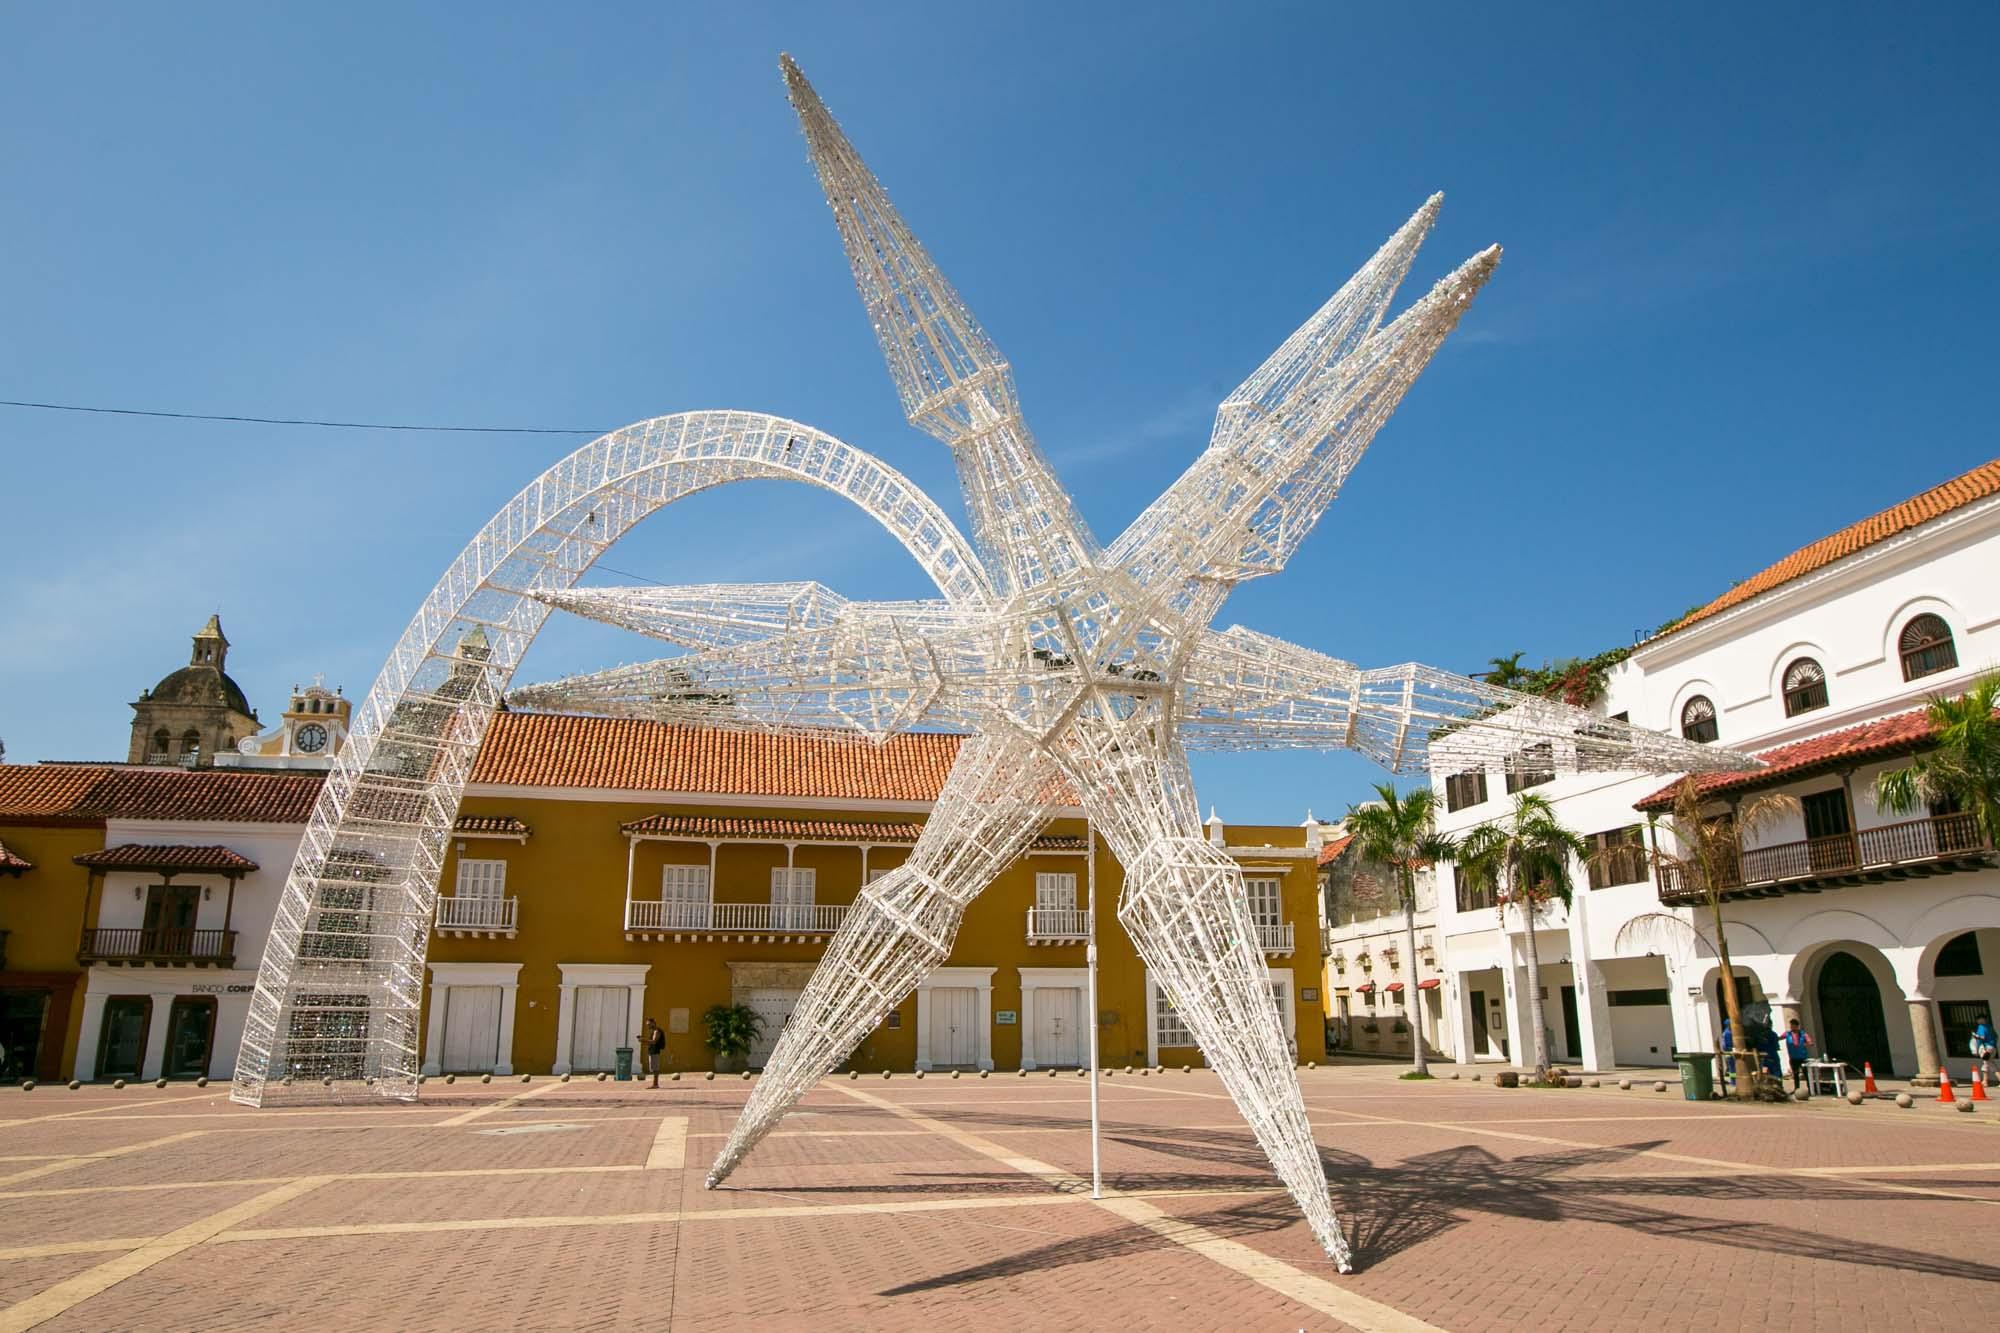 Public art in Cartagena